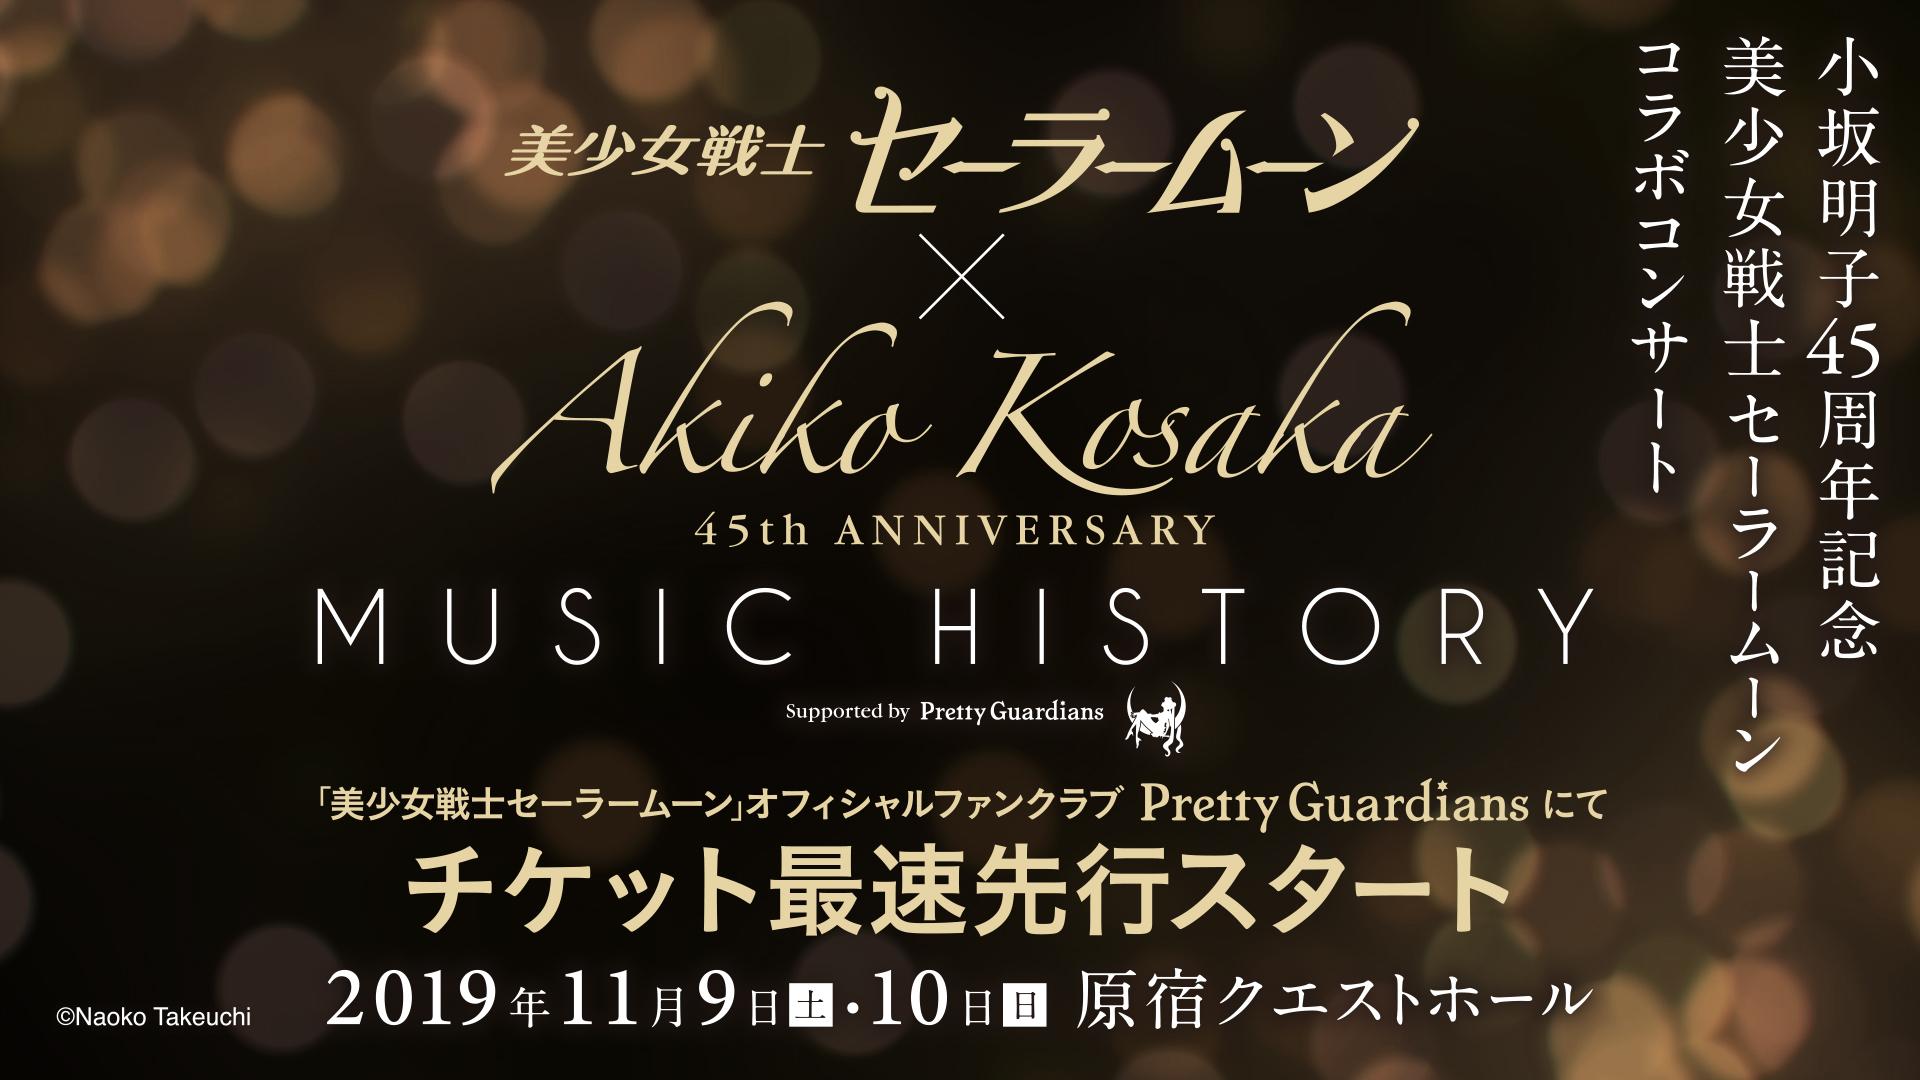 190726_kosaka_FIX.jpg